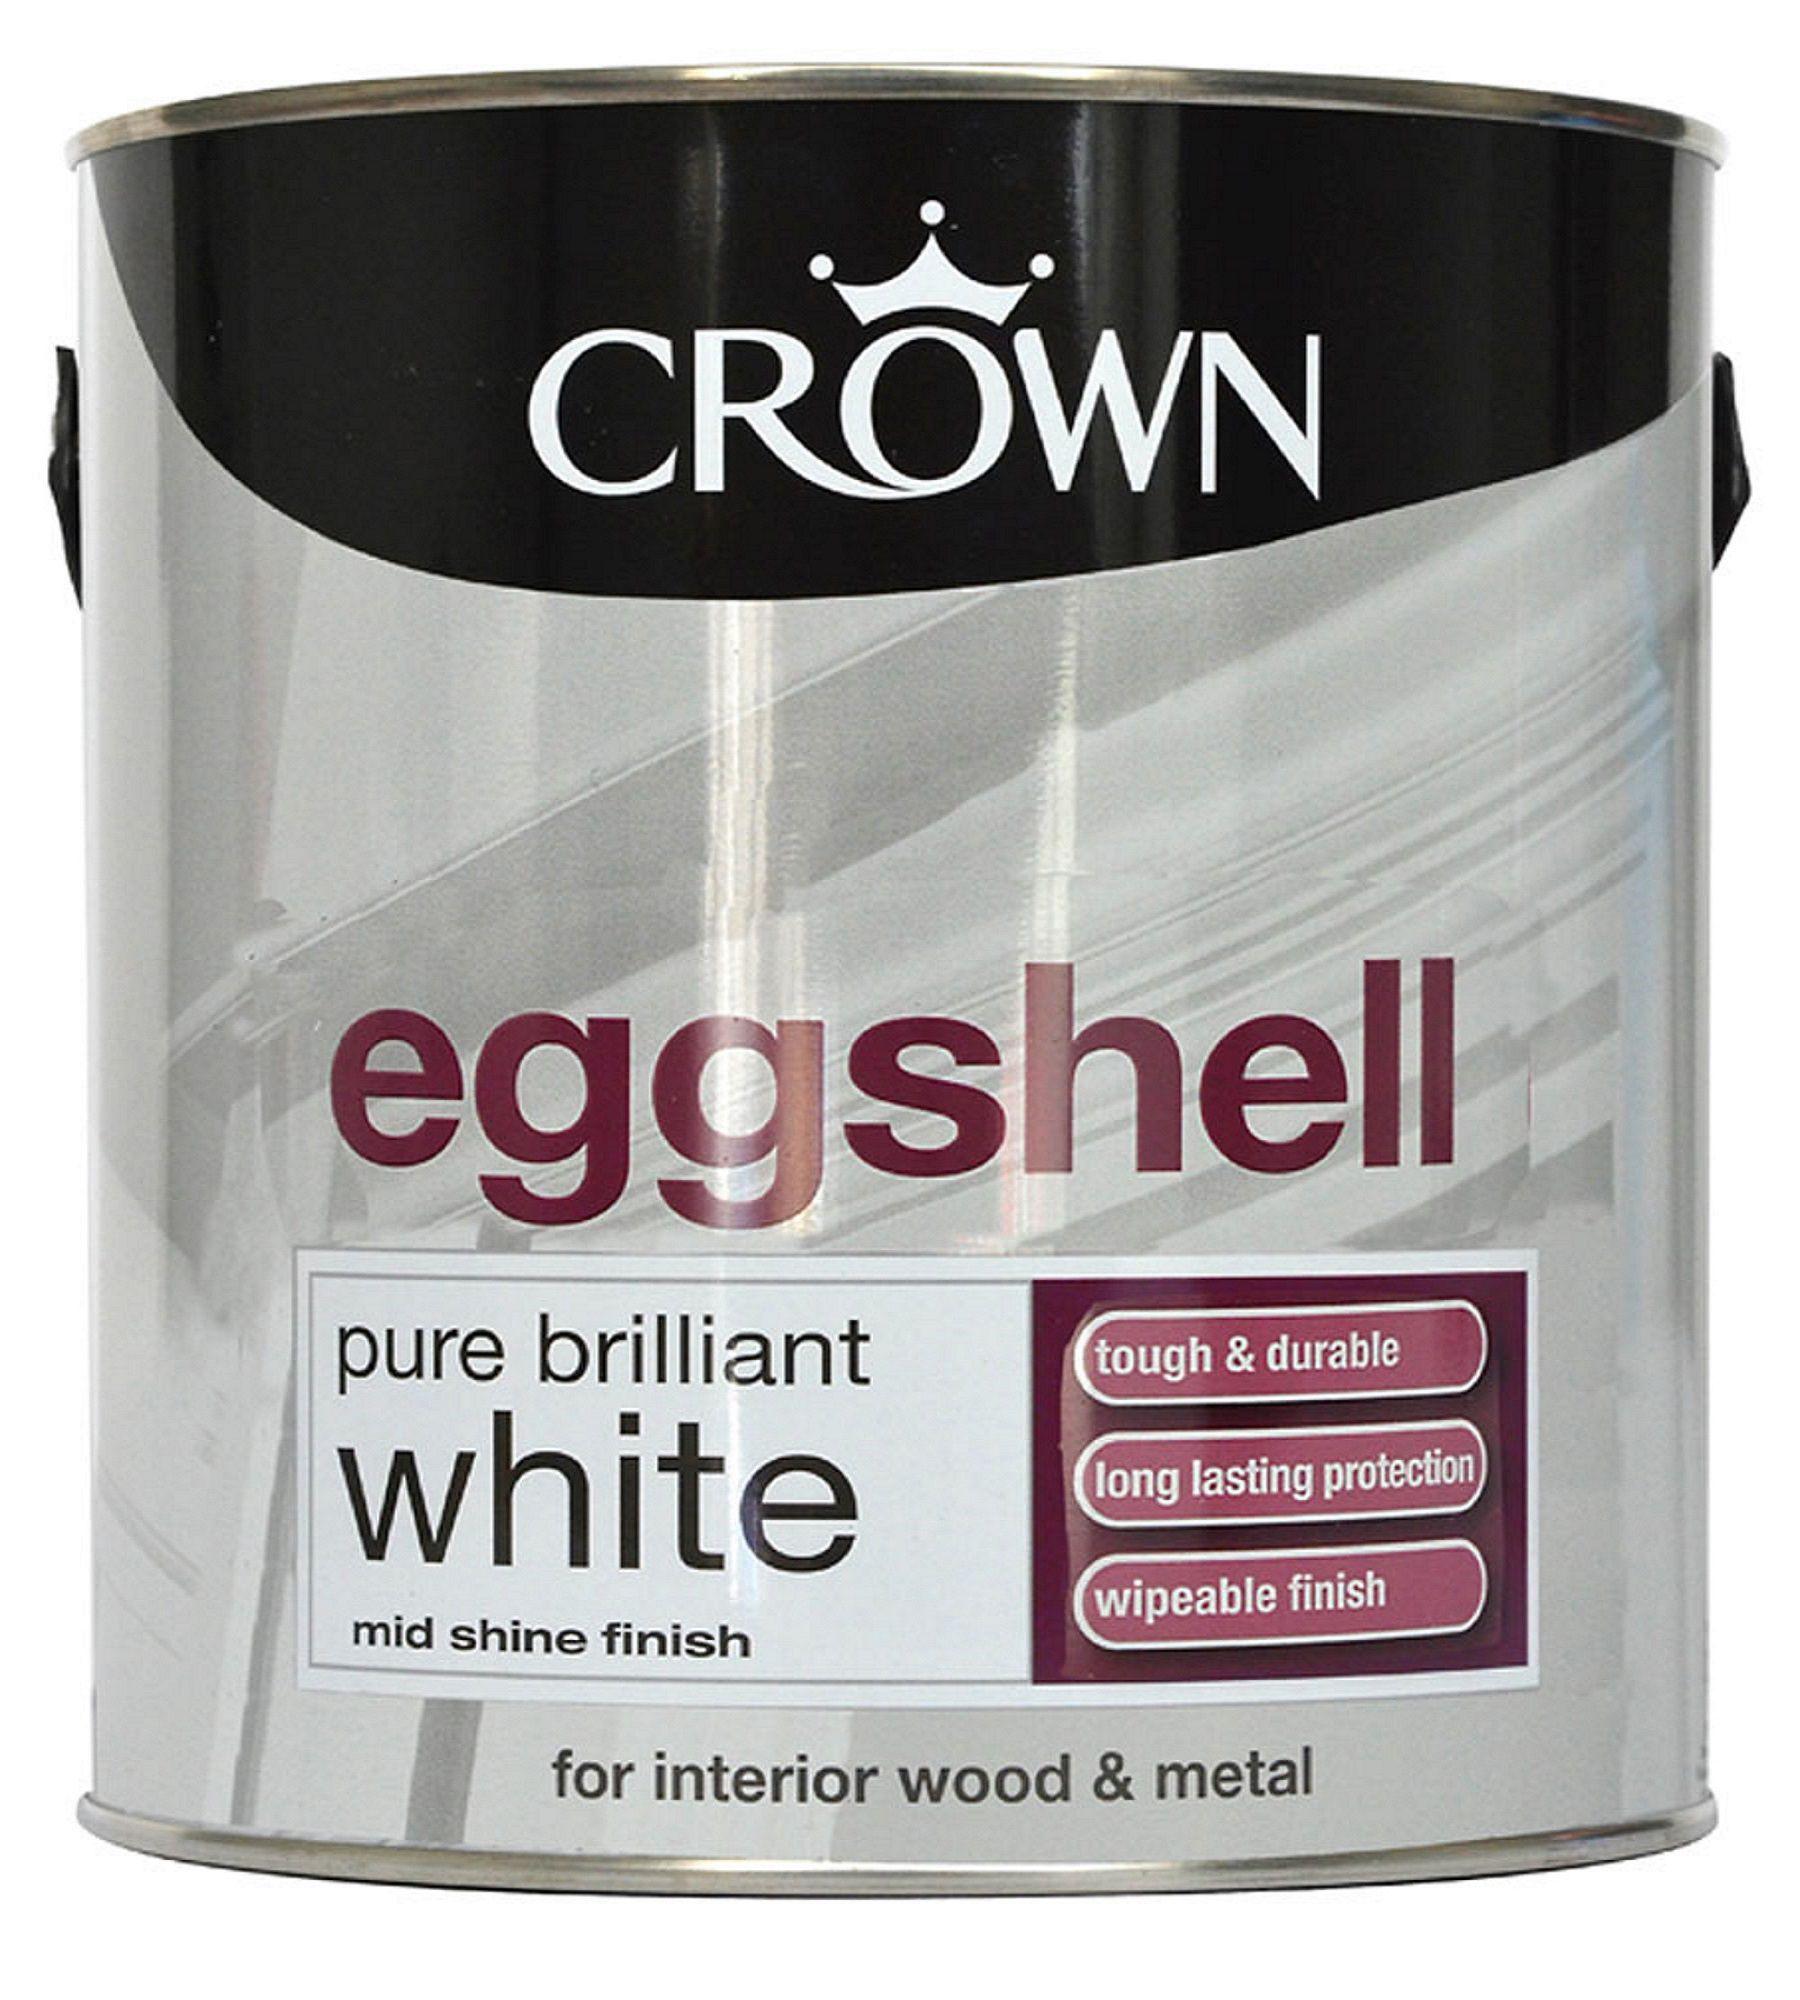 Crown Interior Pure Brilliant White Eggshell Wood U0026 Metal Paint 2500ml |  Departments | DIY At Bu0026Q